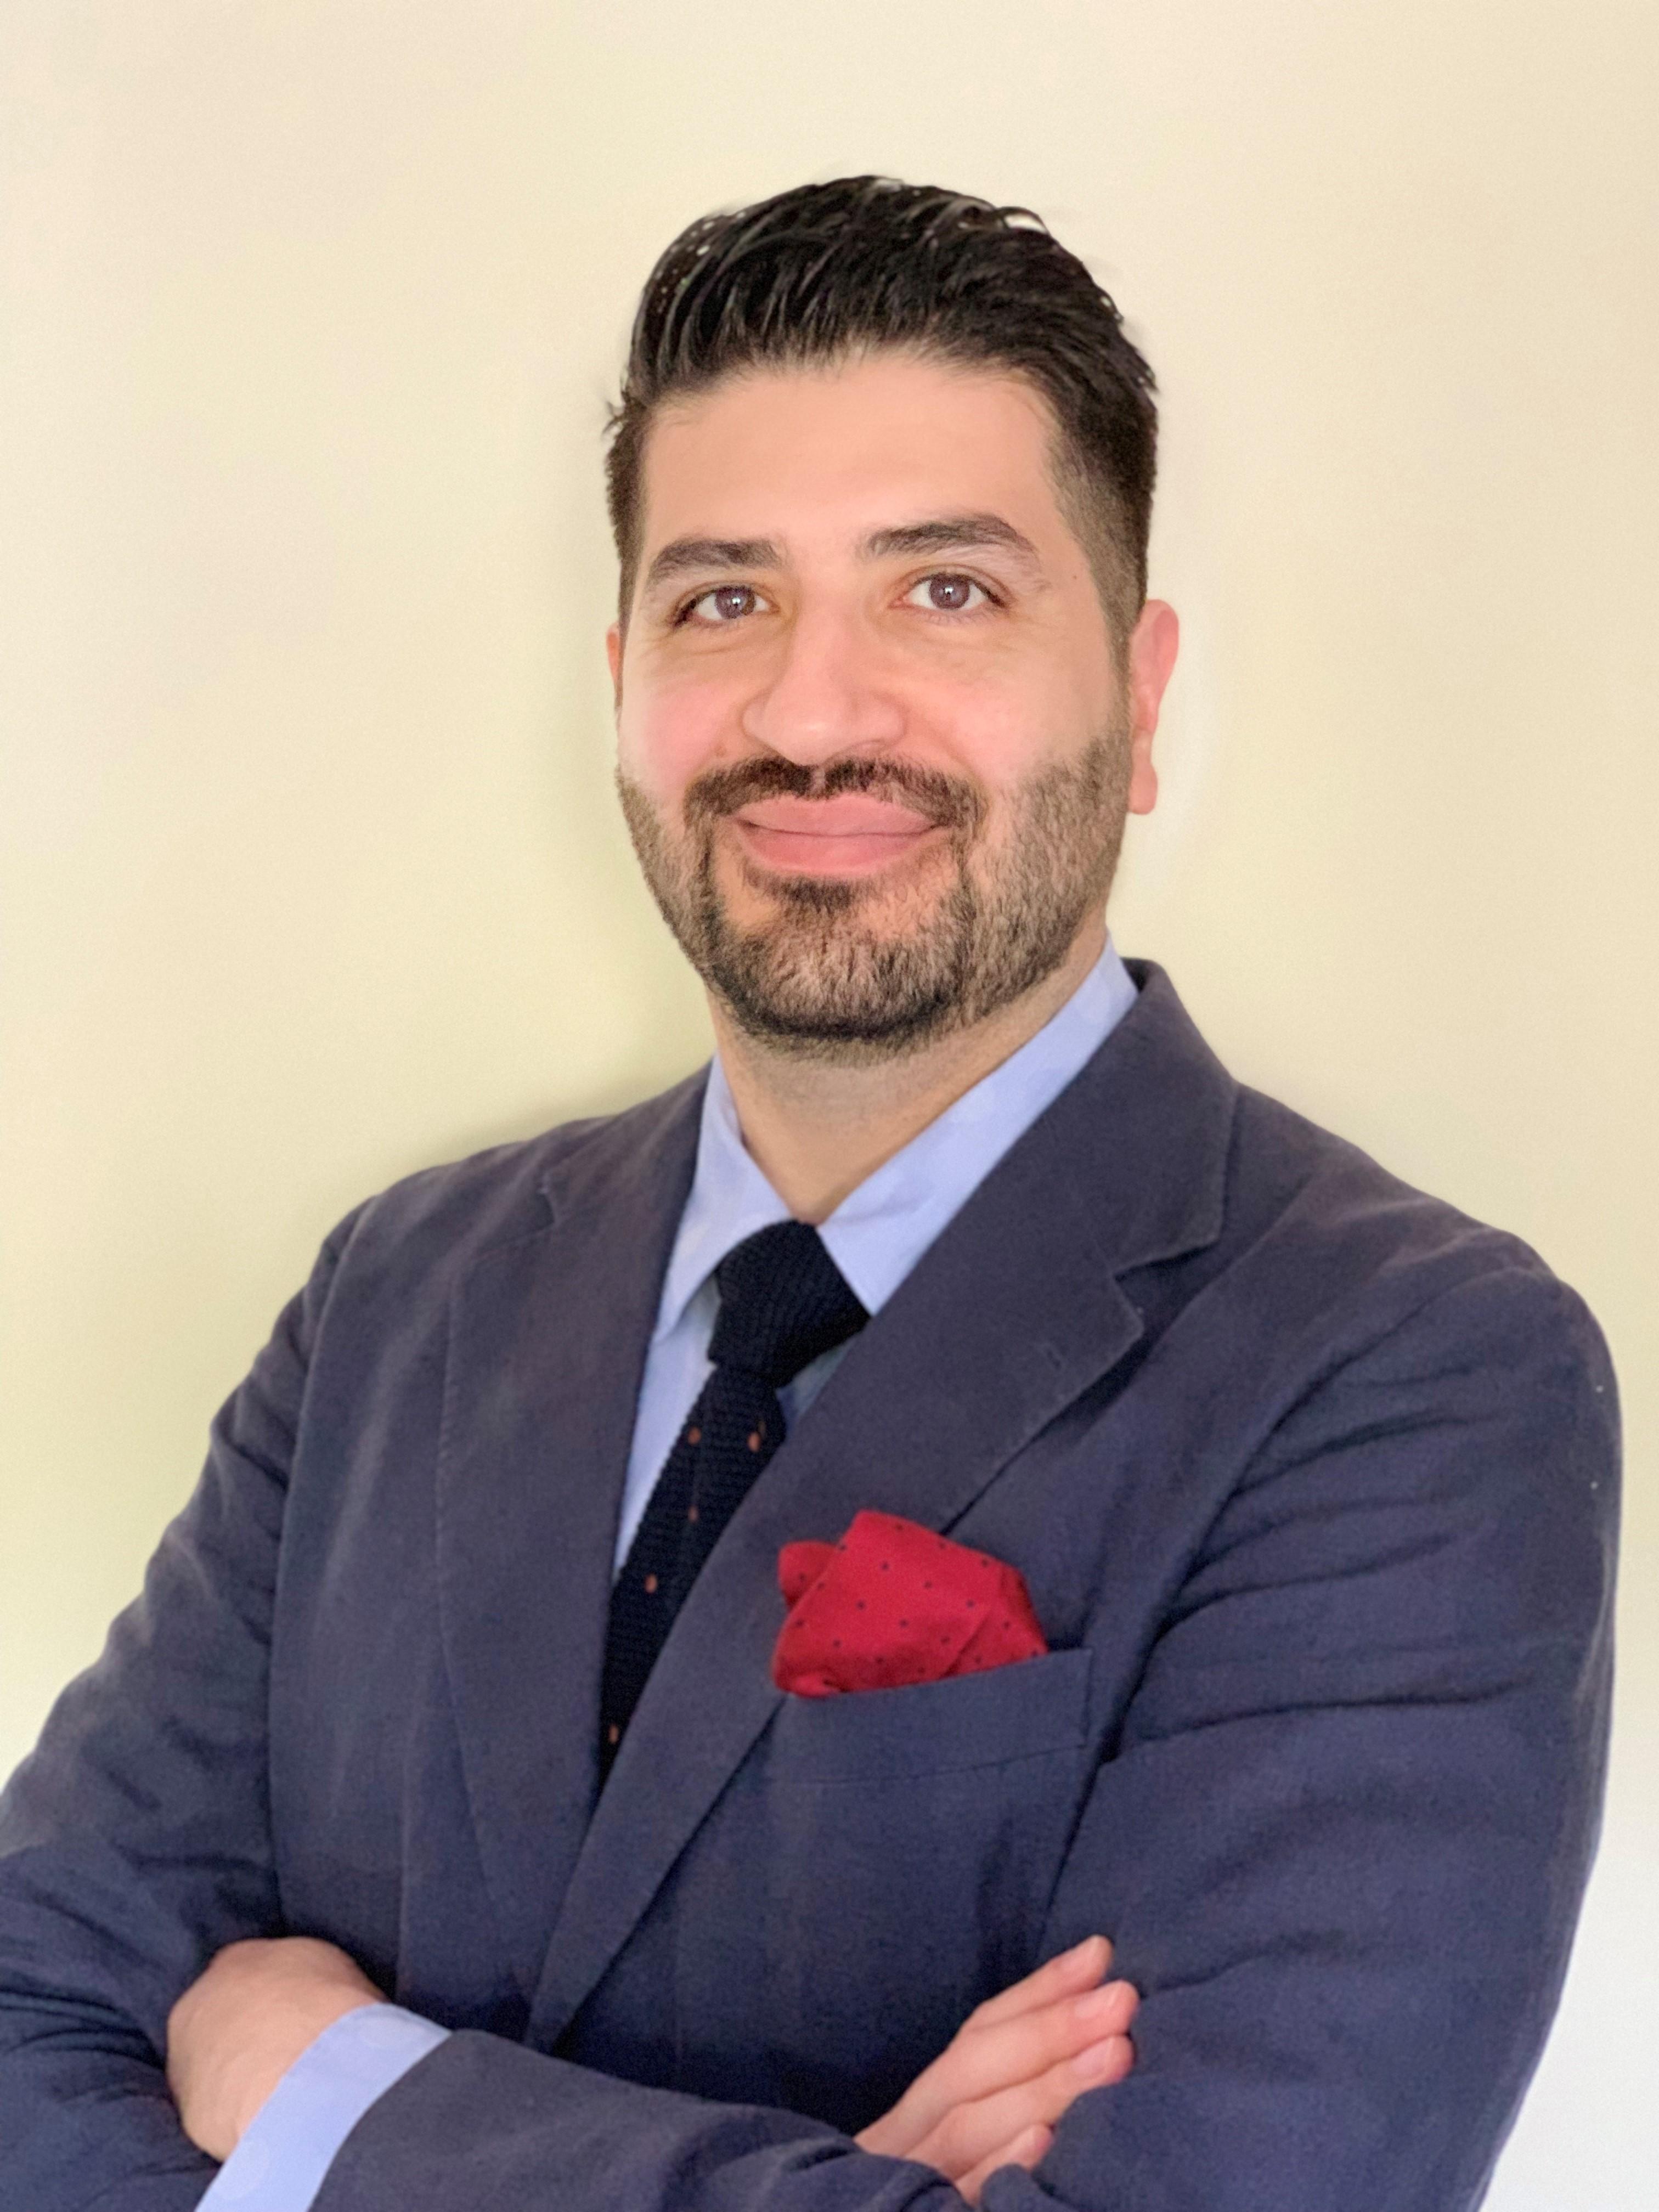 Dr Israel Carmona joins Beacon CARE Fertility team